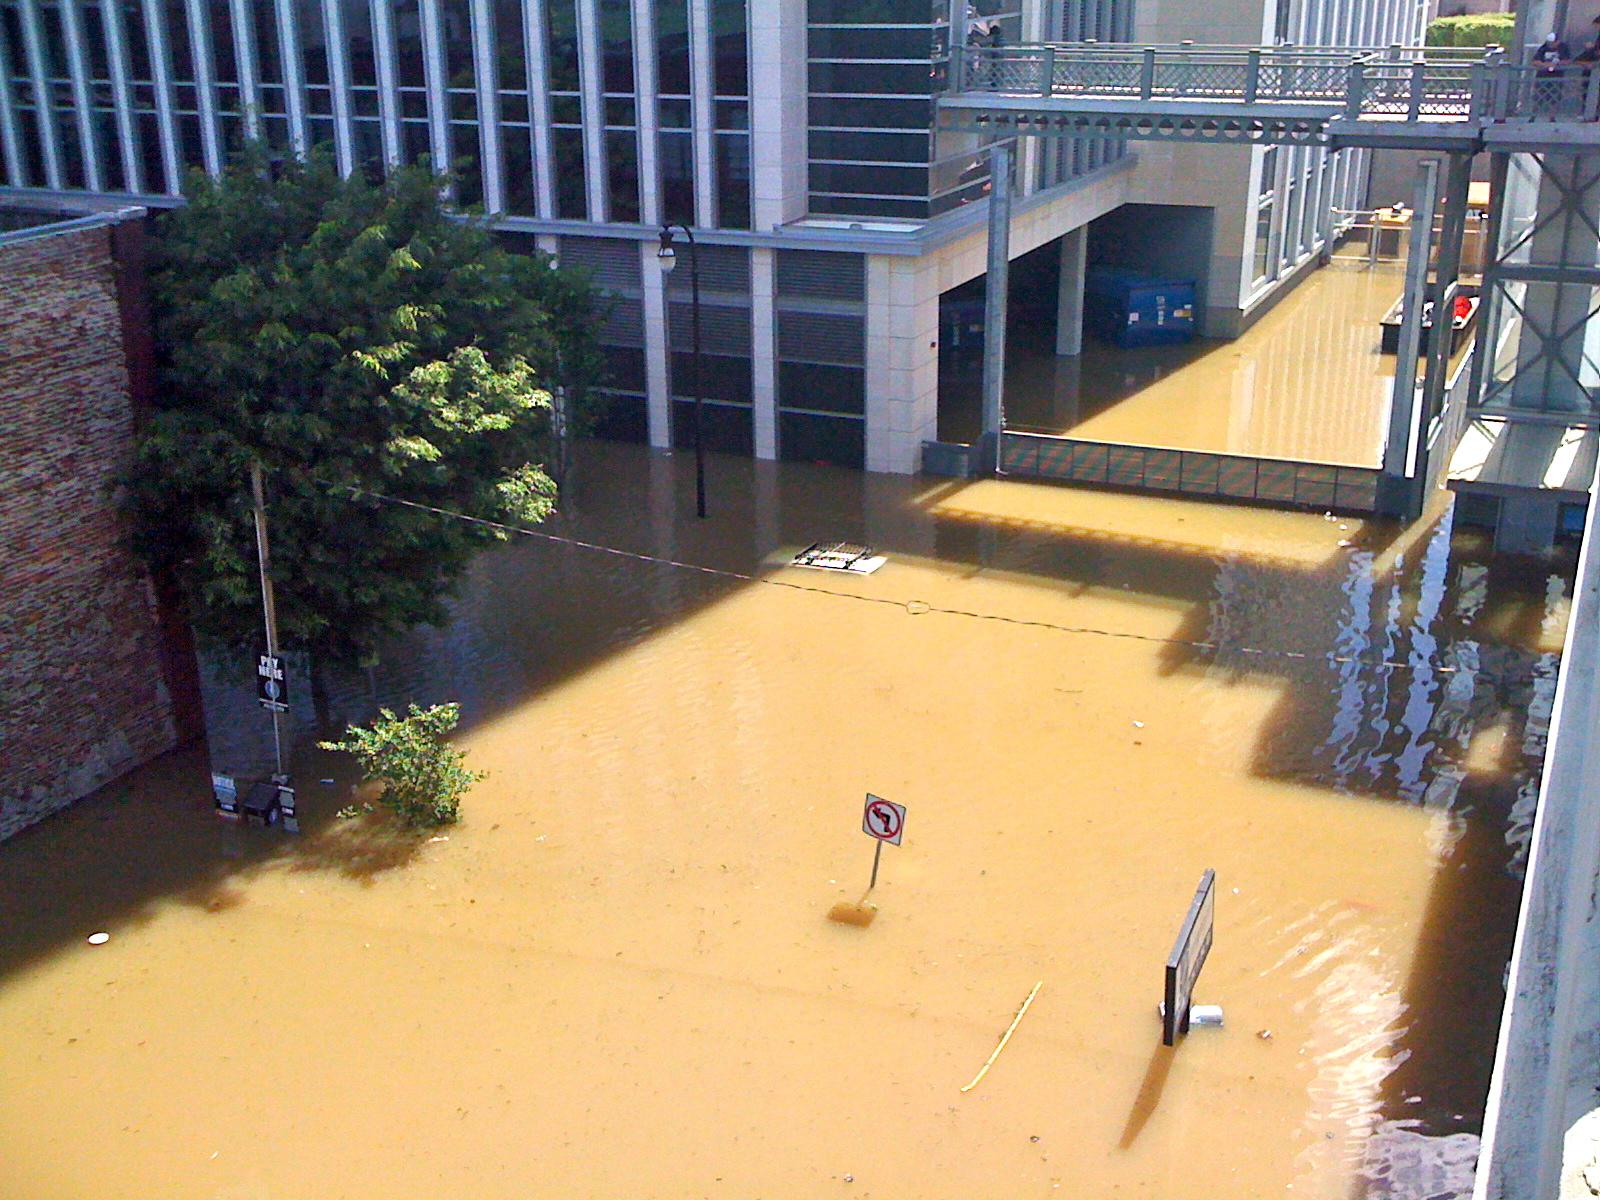 Nashville Flood of 2010 - Floodwaters in Downtown Nashville